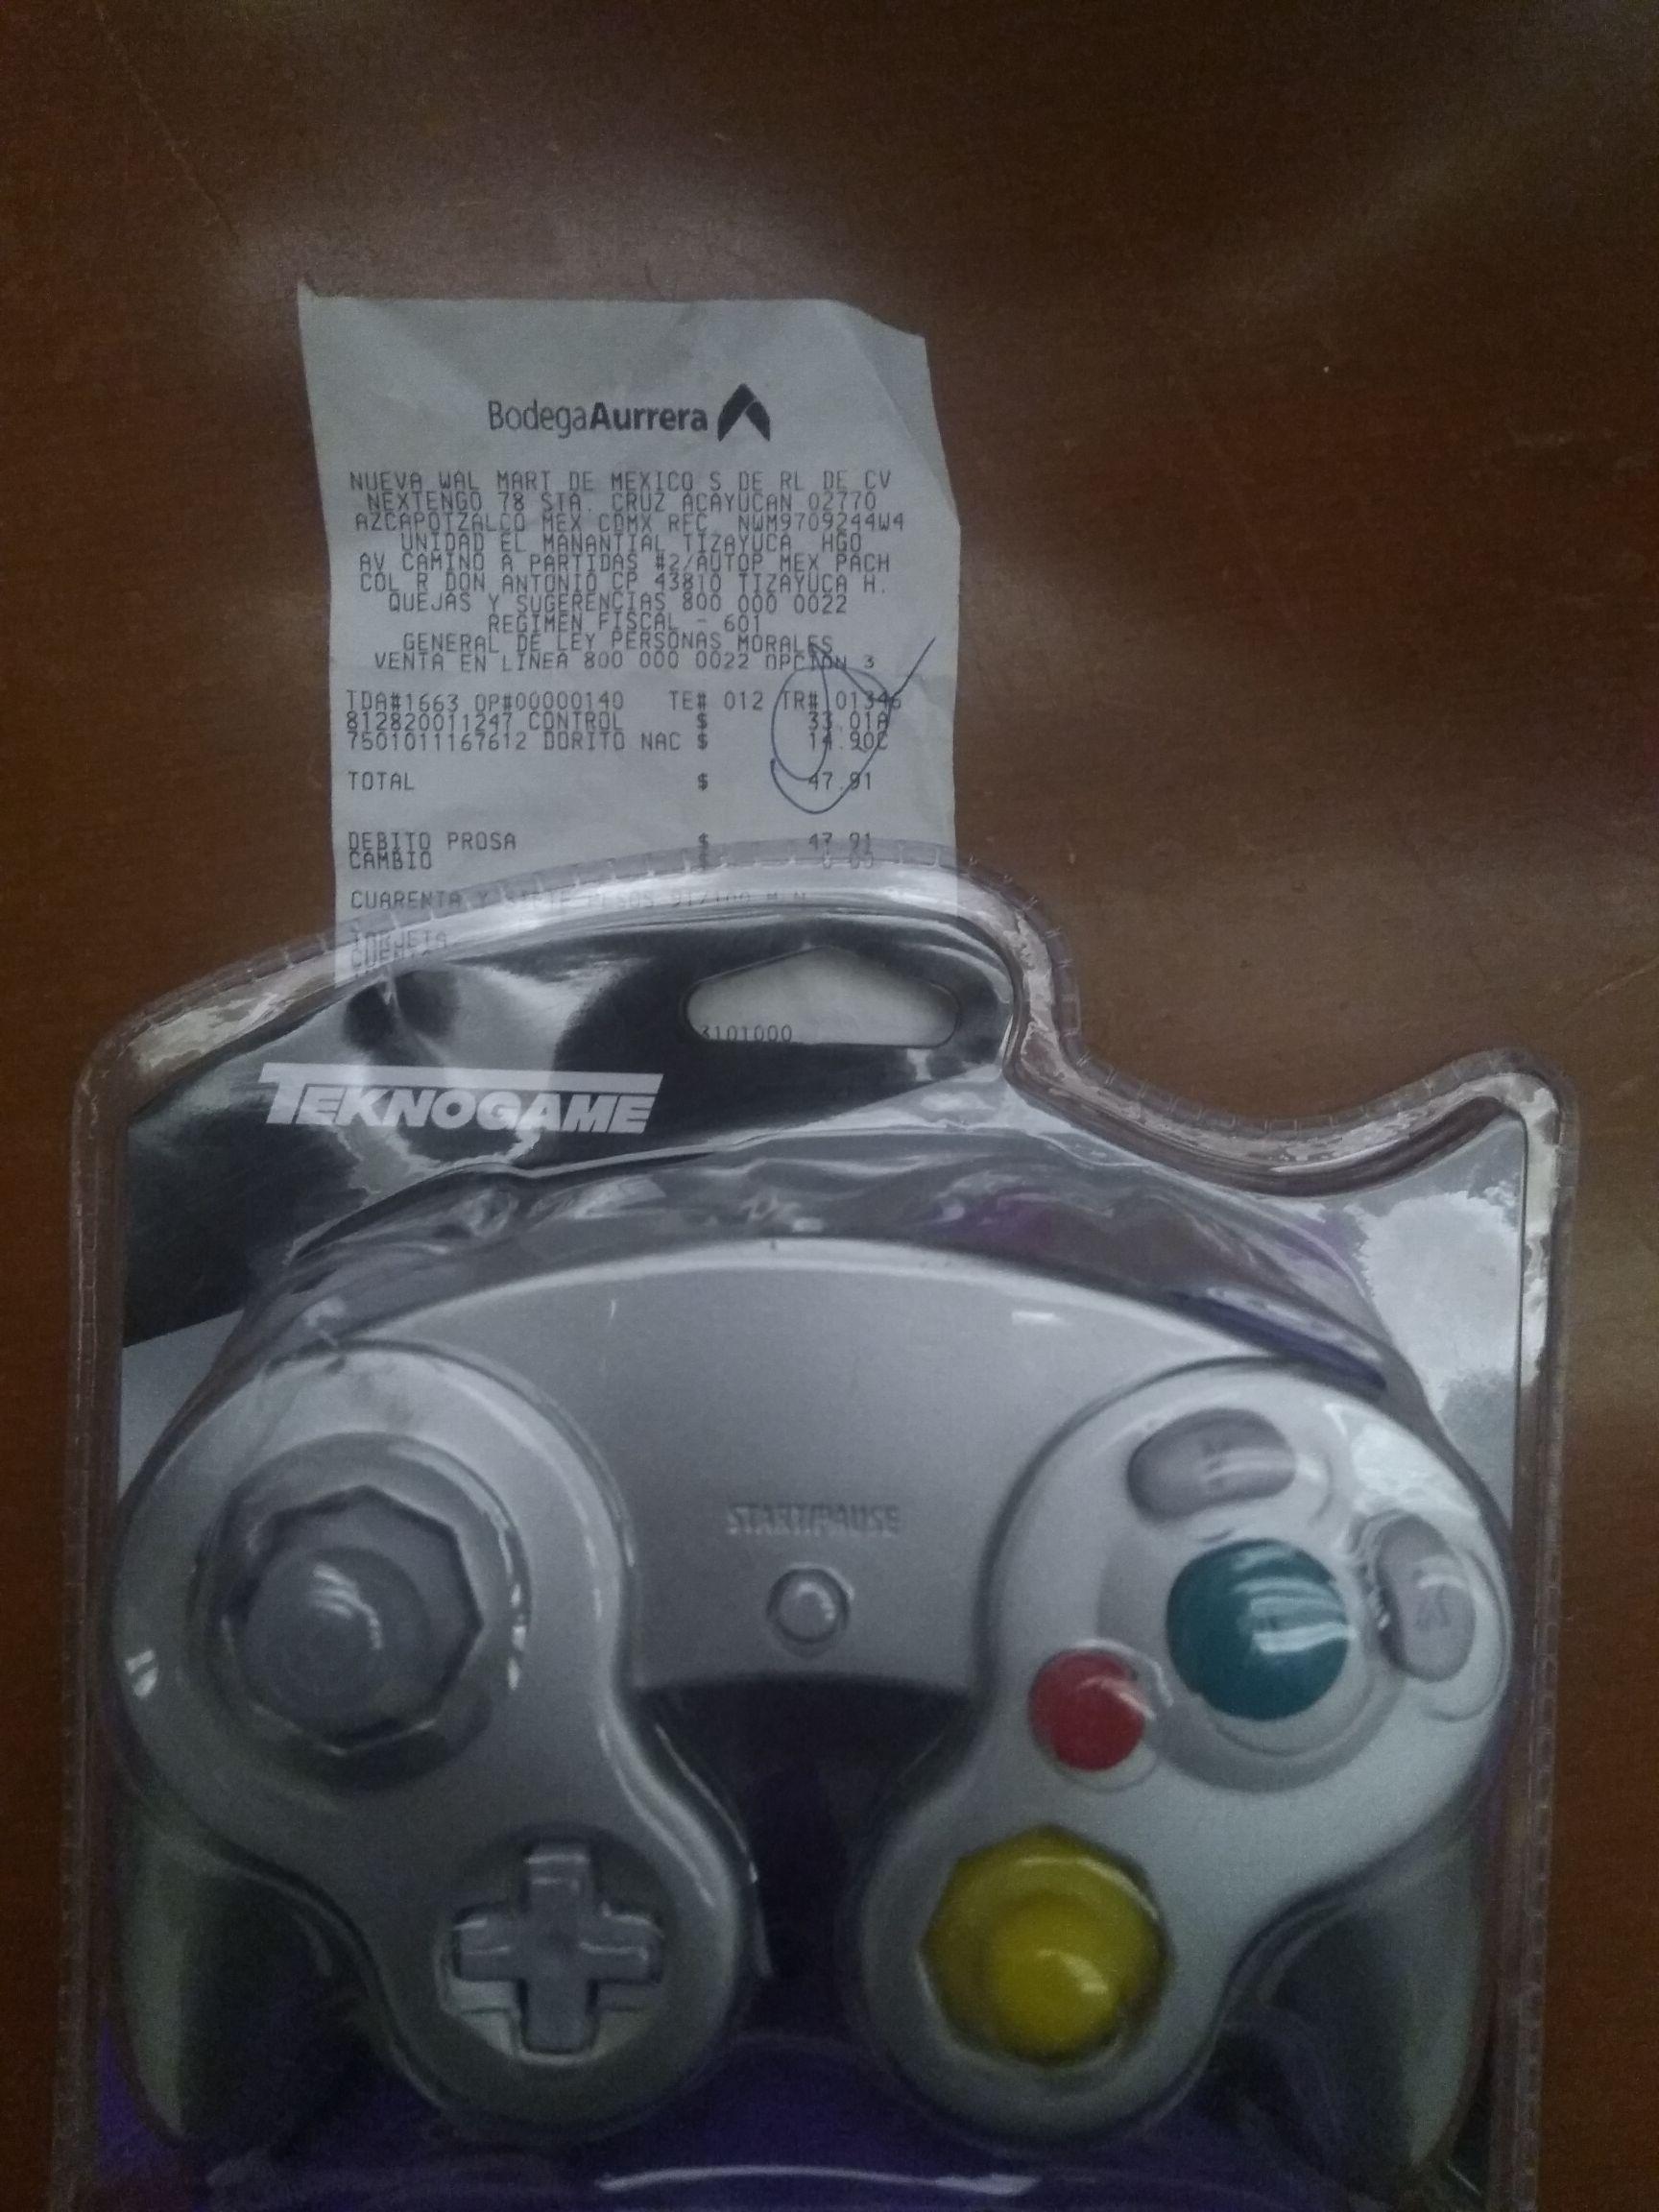 Bodega Aurrera Tizayuca: Control teknogame para Wii y gamecube